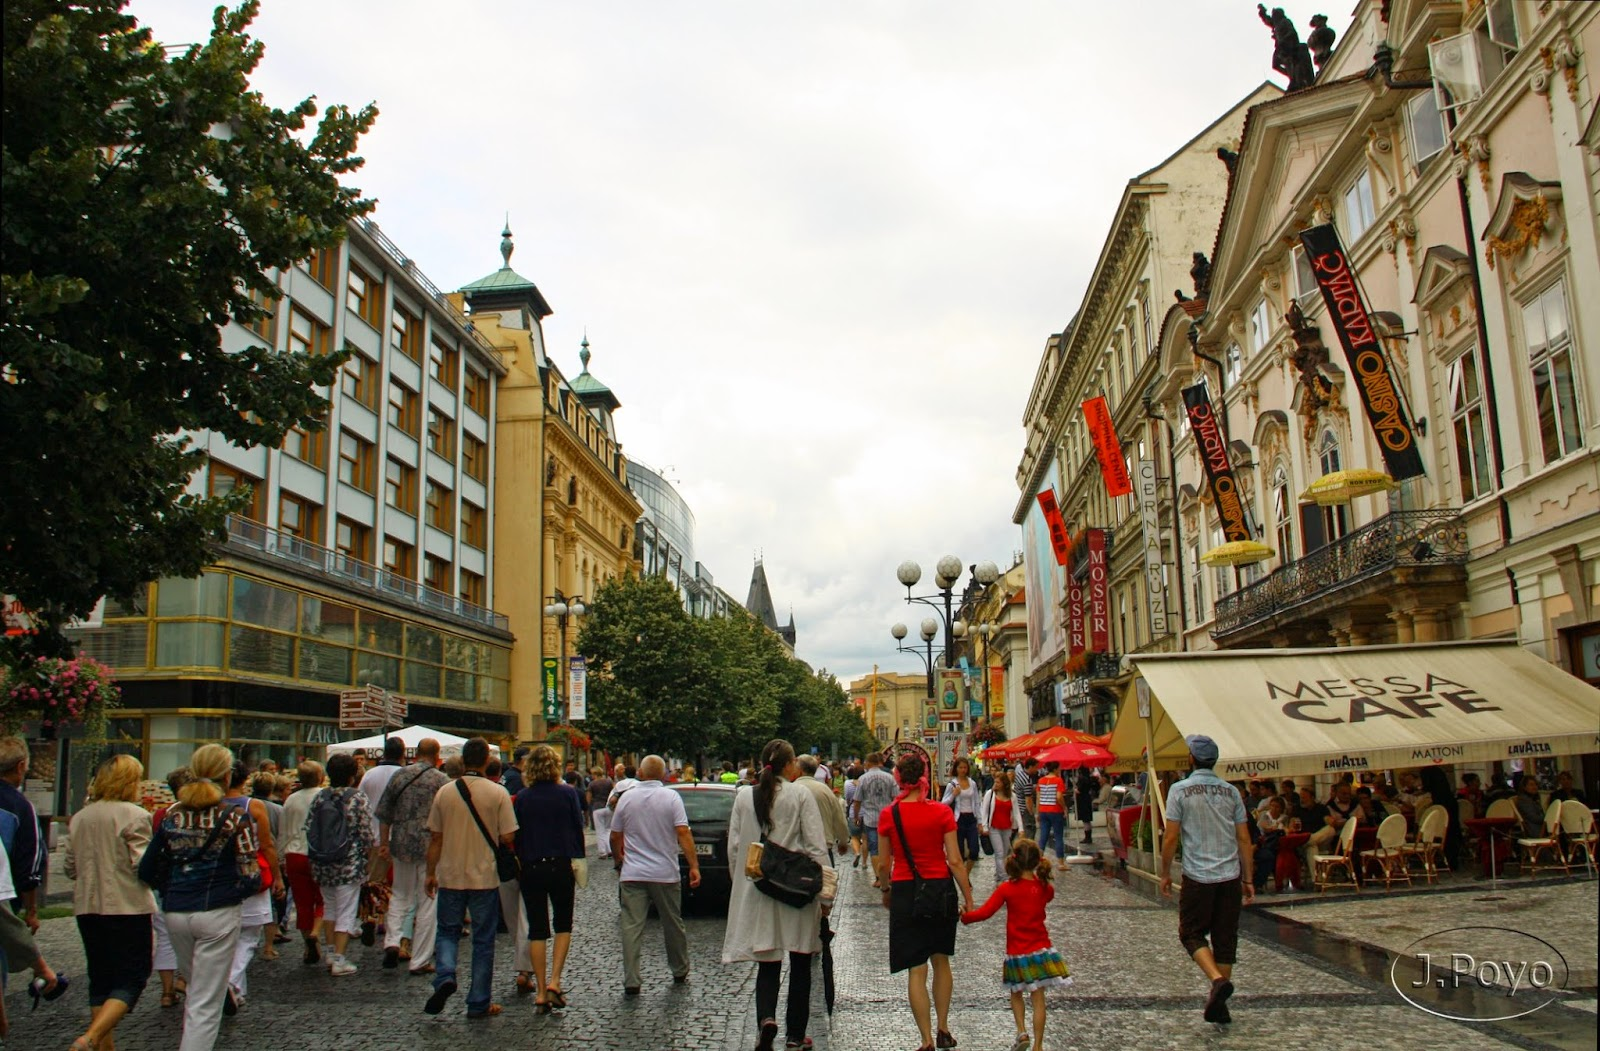 calle Na příkopě de Praga